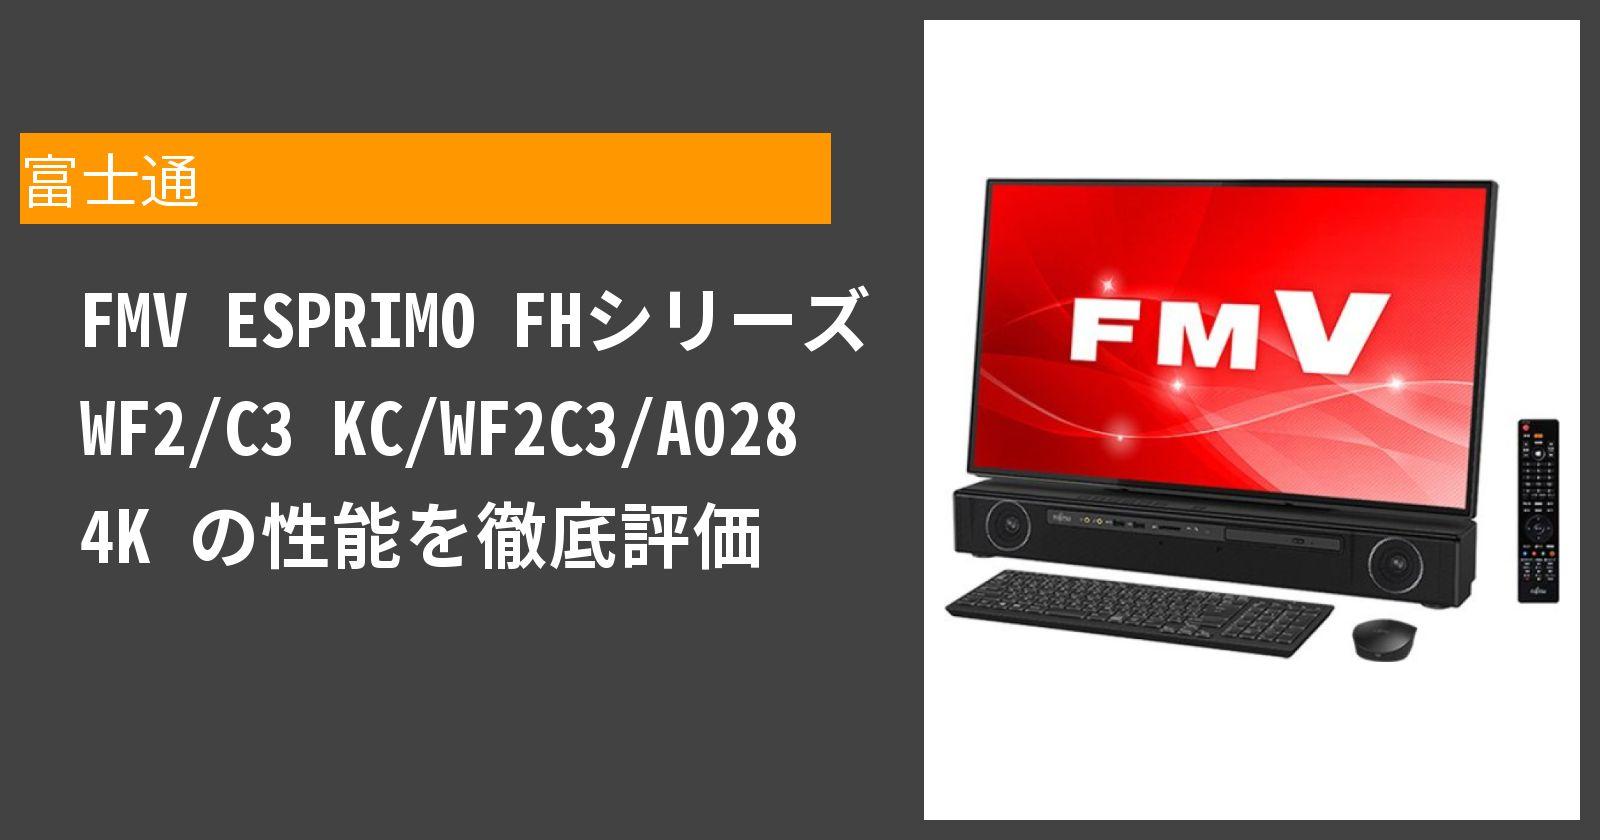 FMV ESPRIMO FHシリーズ WF2/C3 KC/WF2C3/A028 4K の性能を徹底評価